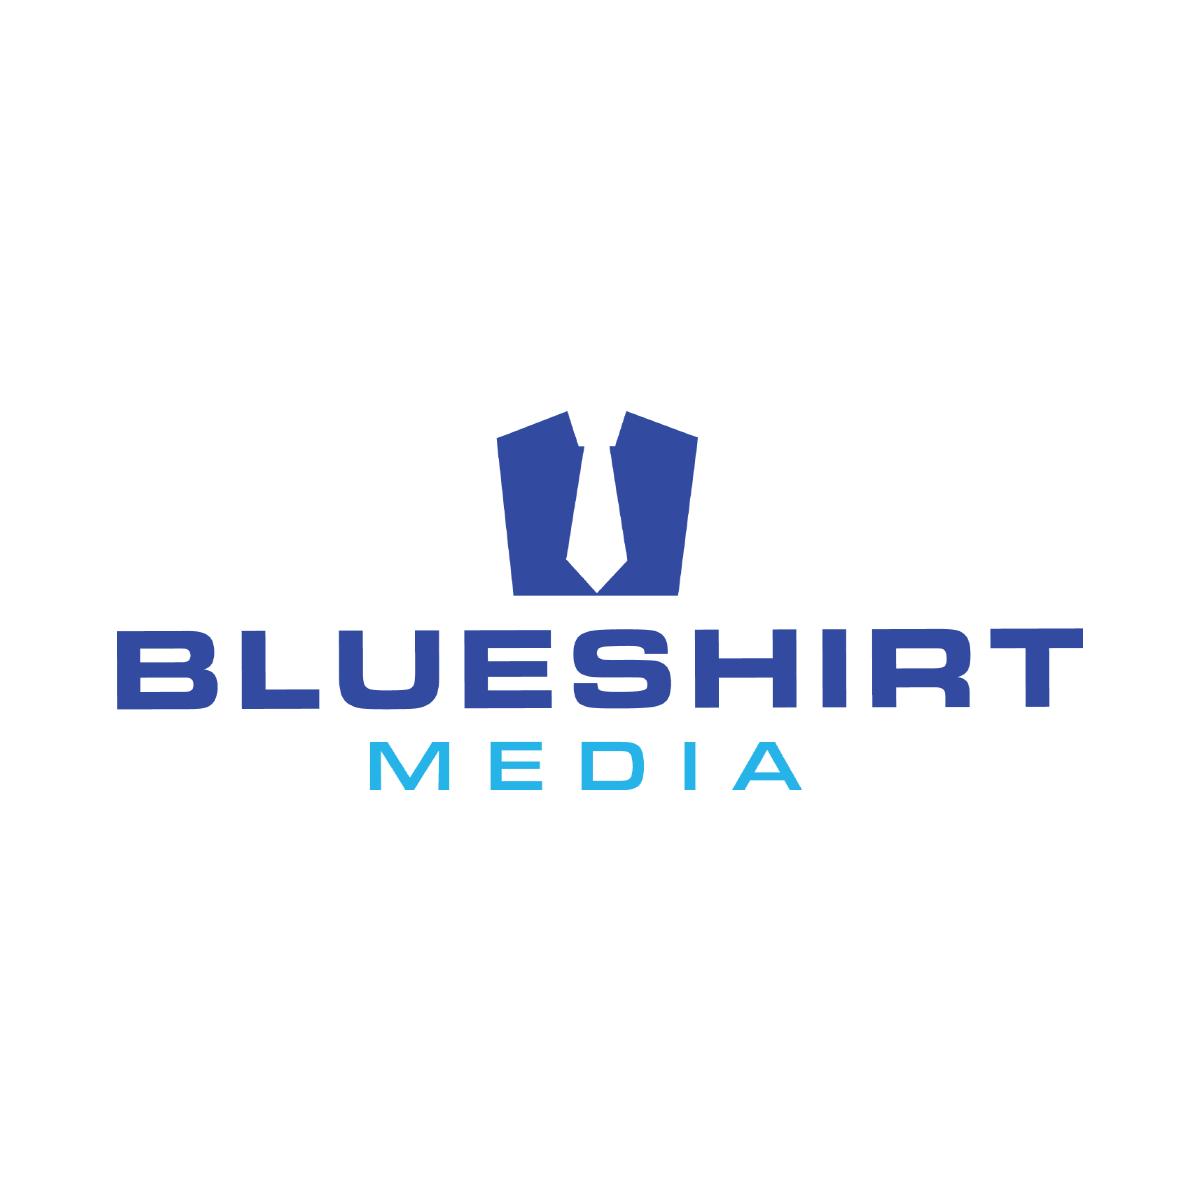 Blue Shirt Media